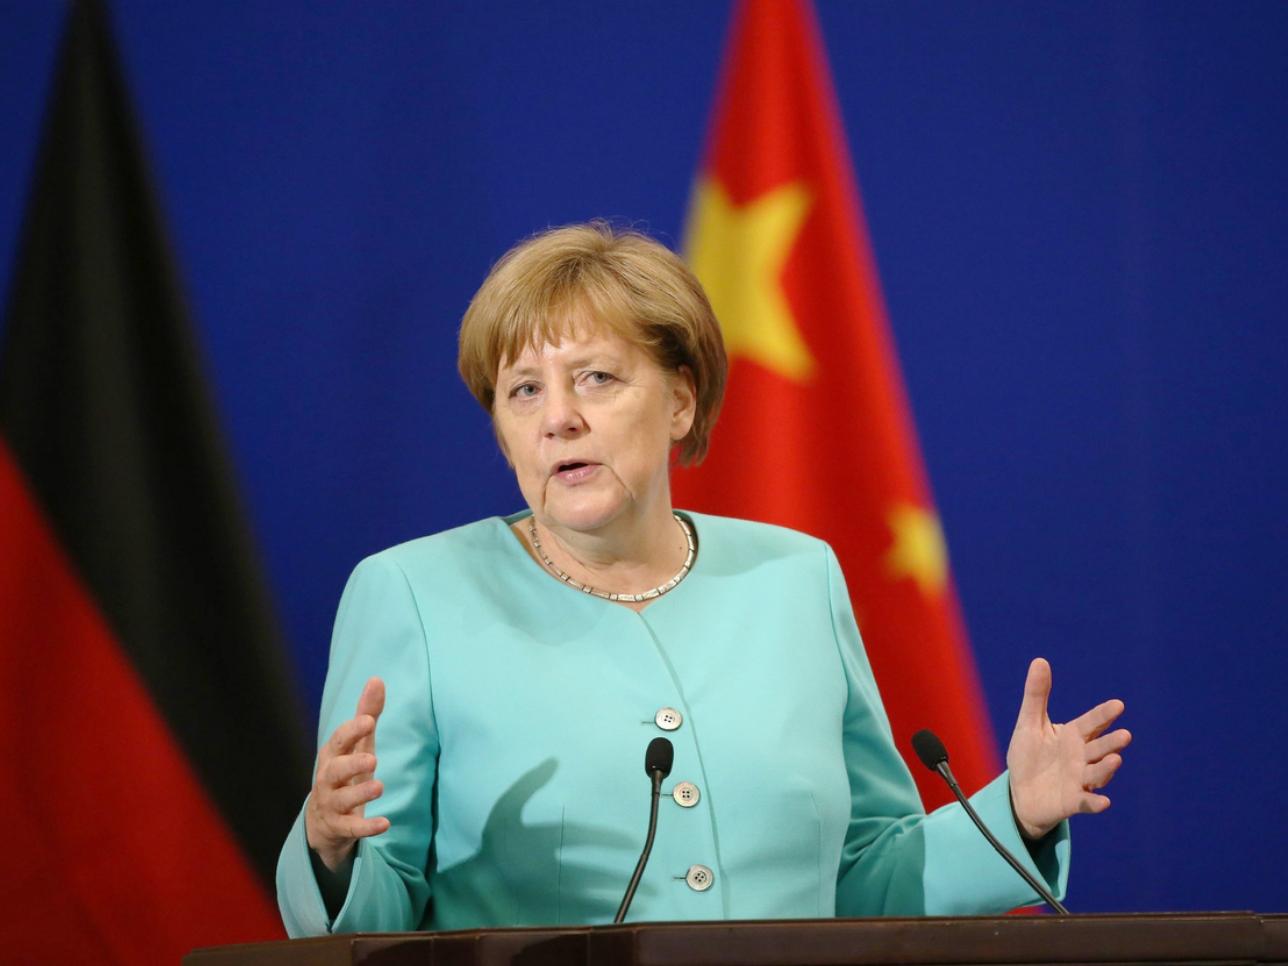 Merkel to make official visit to China this weekend